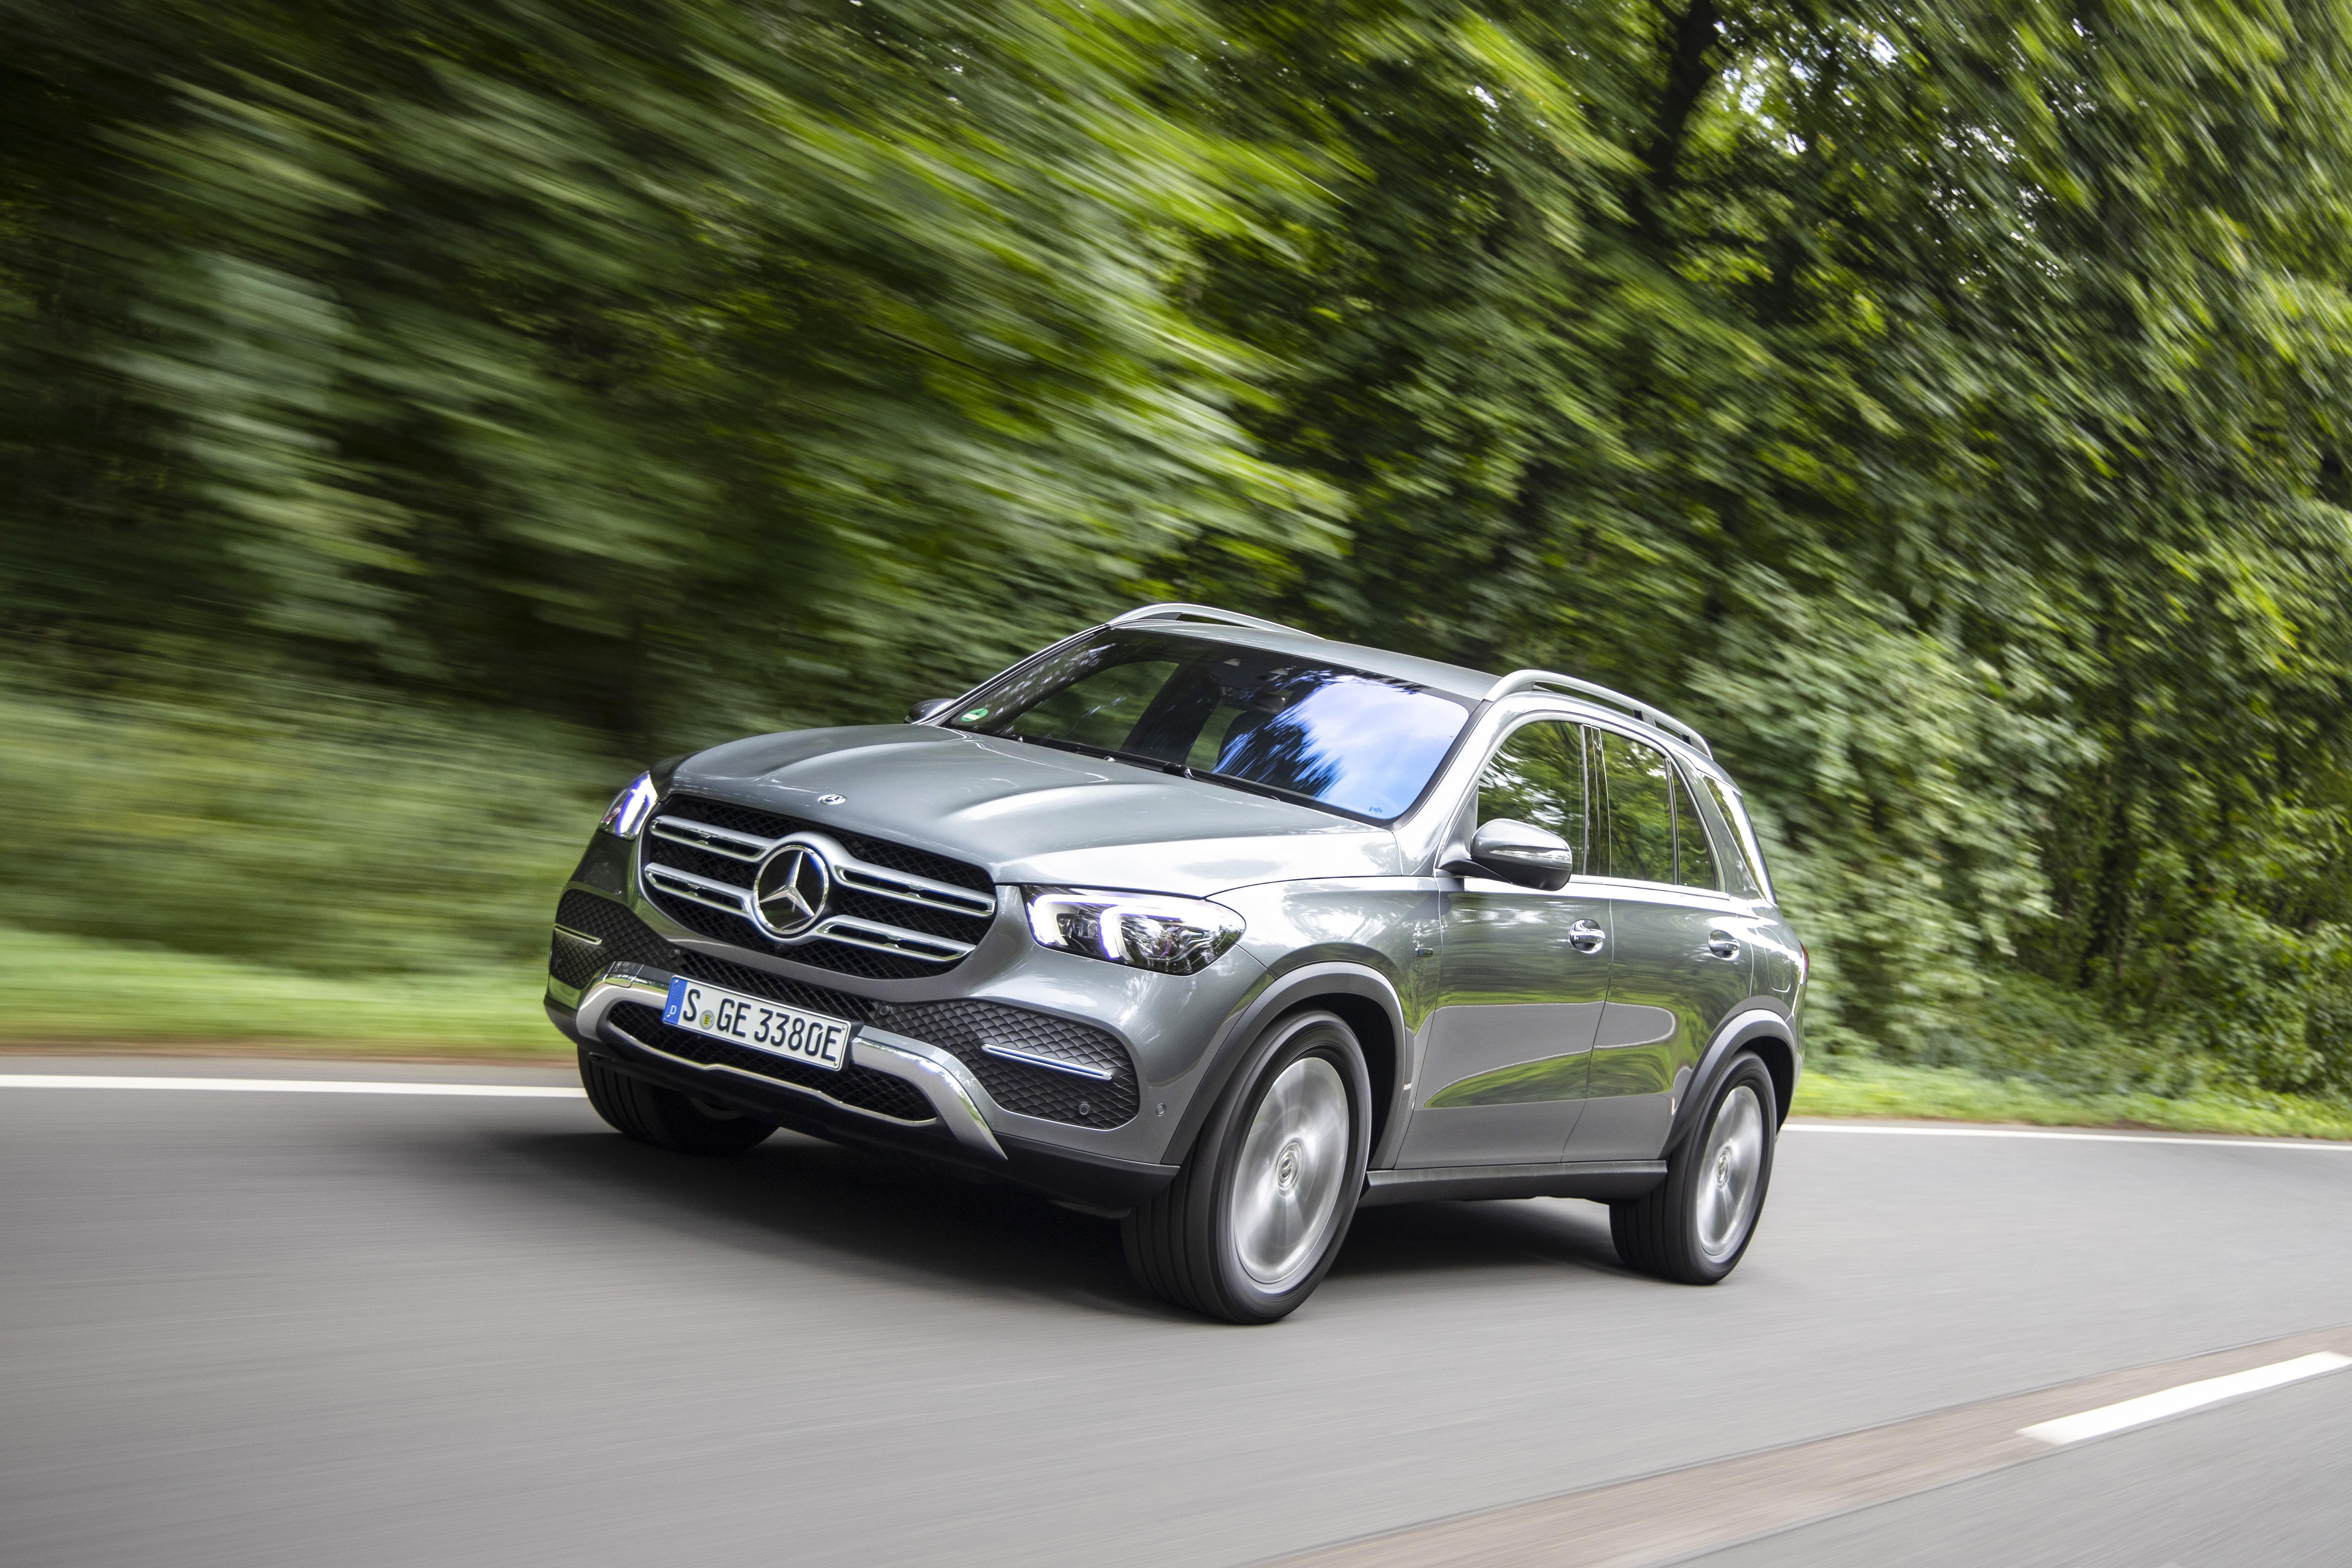 Nu kommer Mercedes-Benz GLE som laddhybrid – med över 9 mil räckvidd.